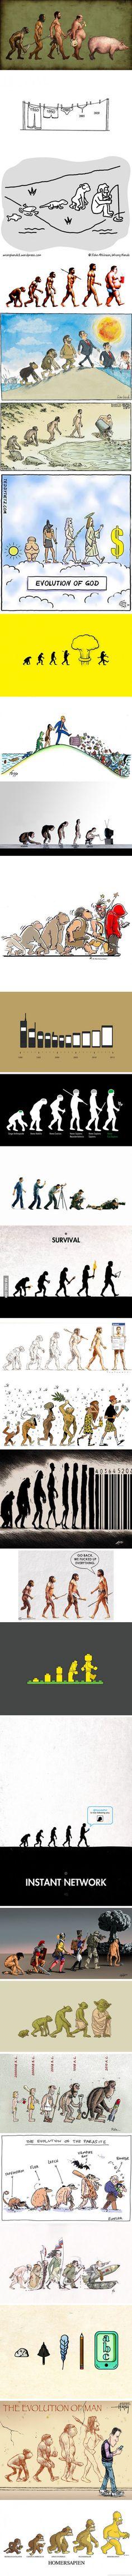 29 Satirical Evolution Cartoons To Celebrate Darwin Day